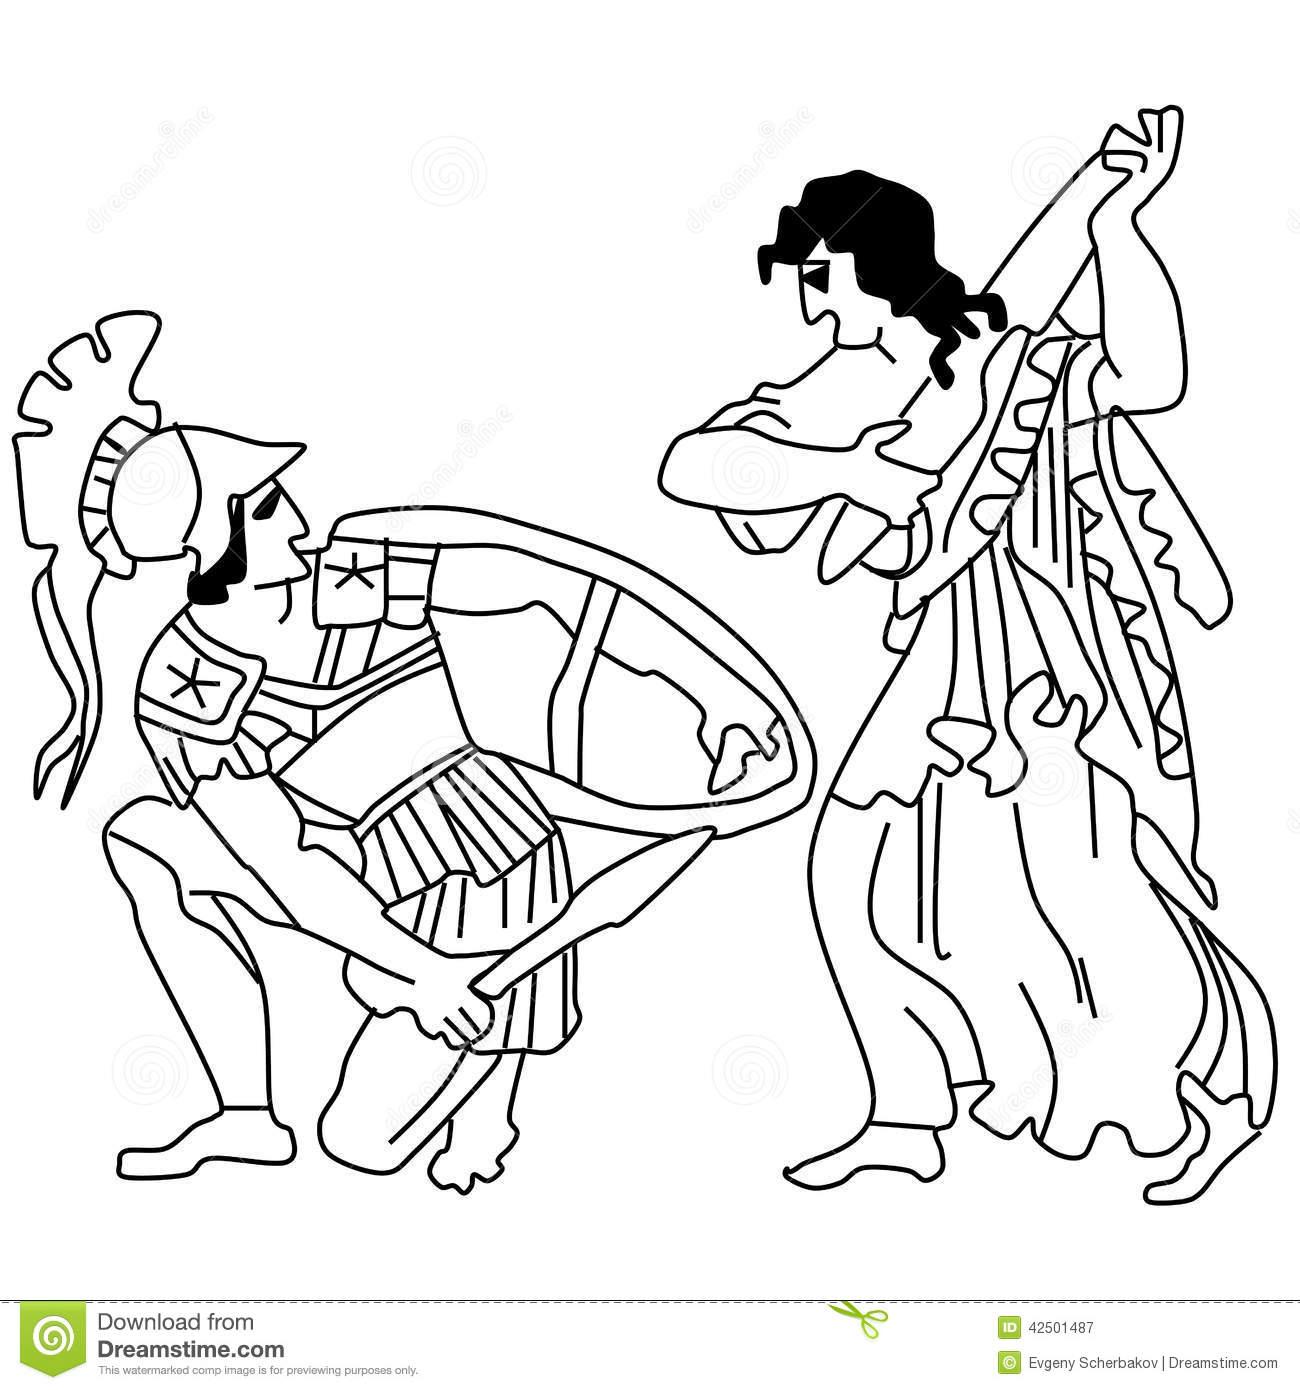 Mythology clipart myth legend Myths greece legend greece legend